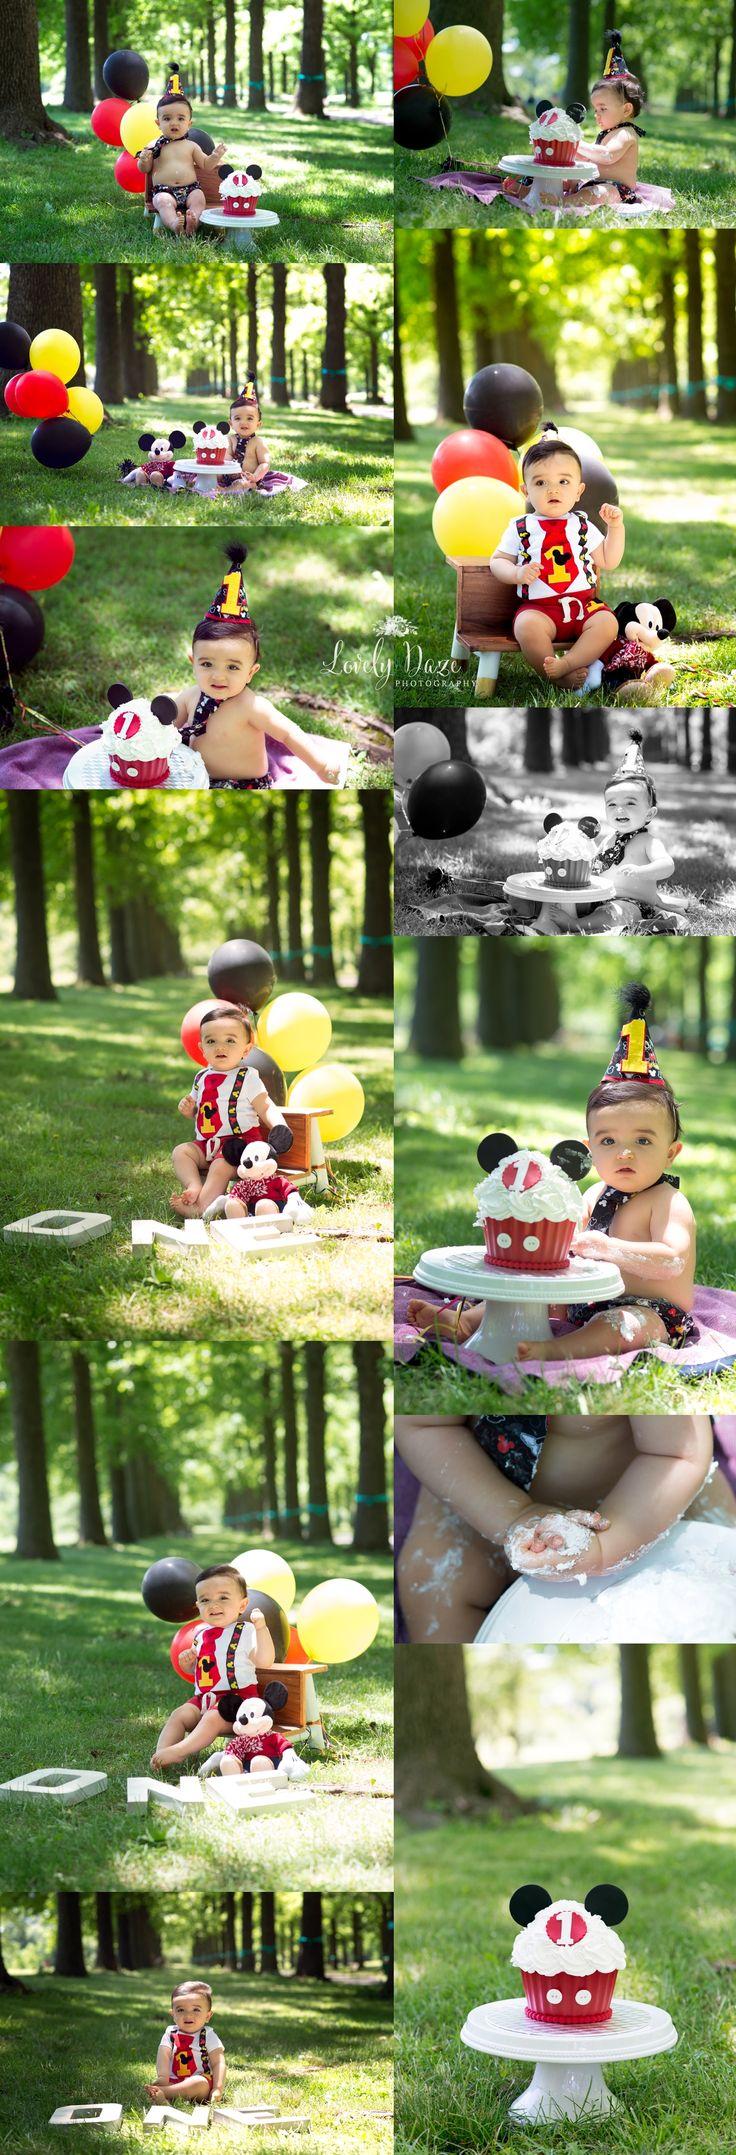 Mickey Mouse Cake Smash